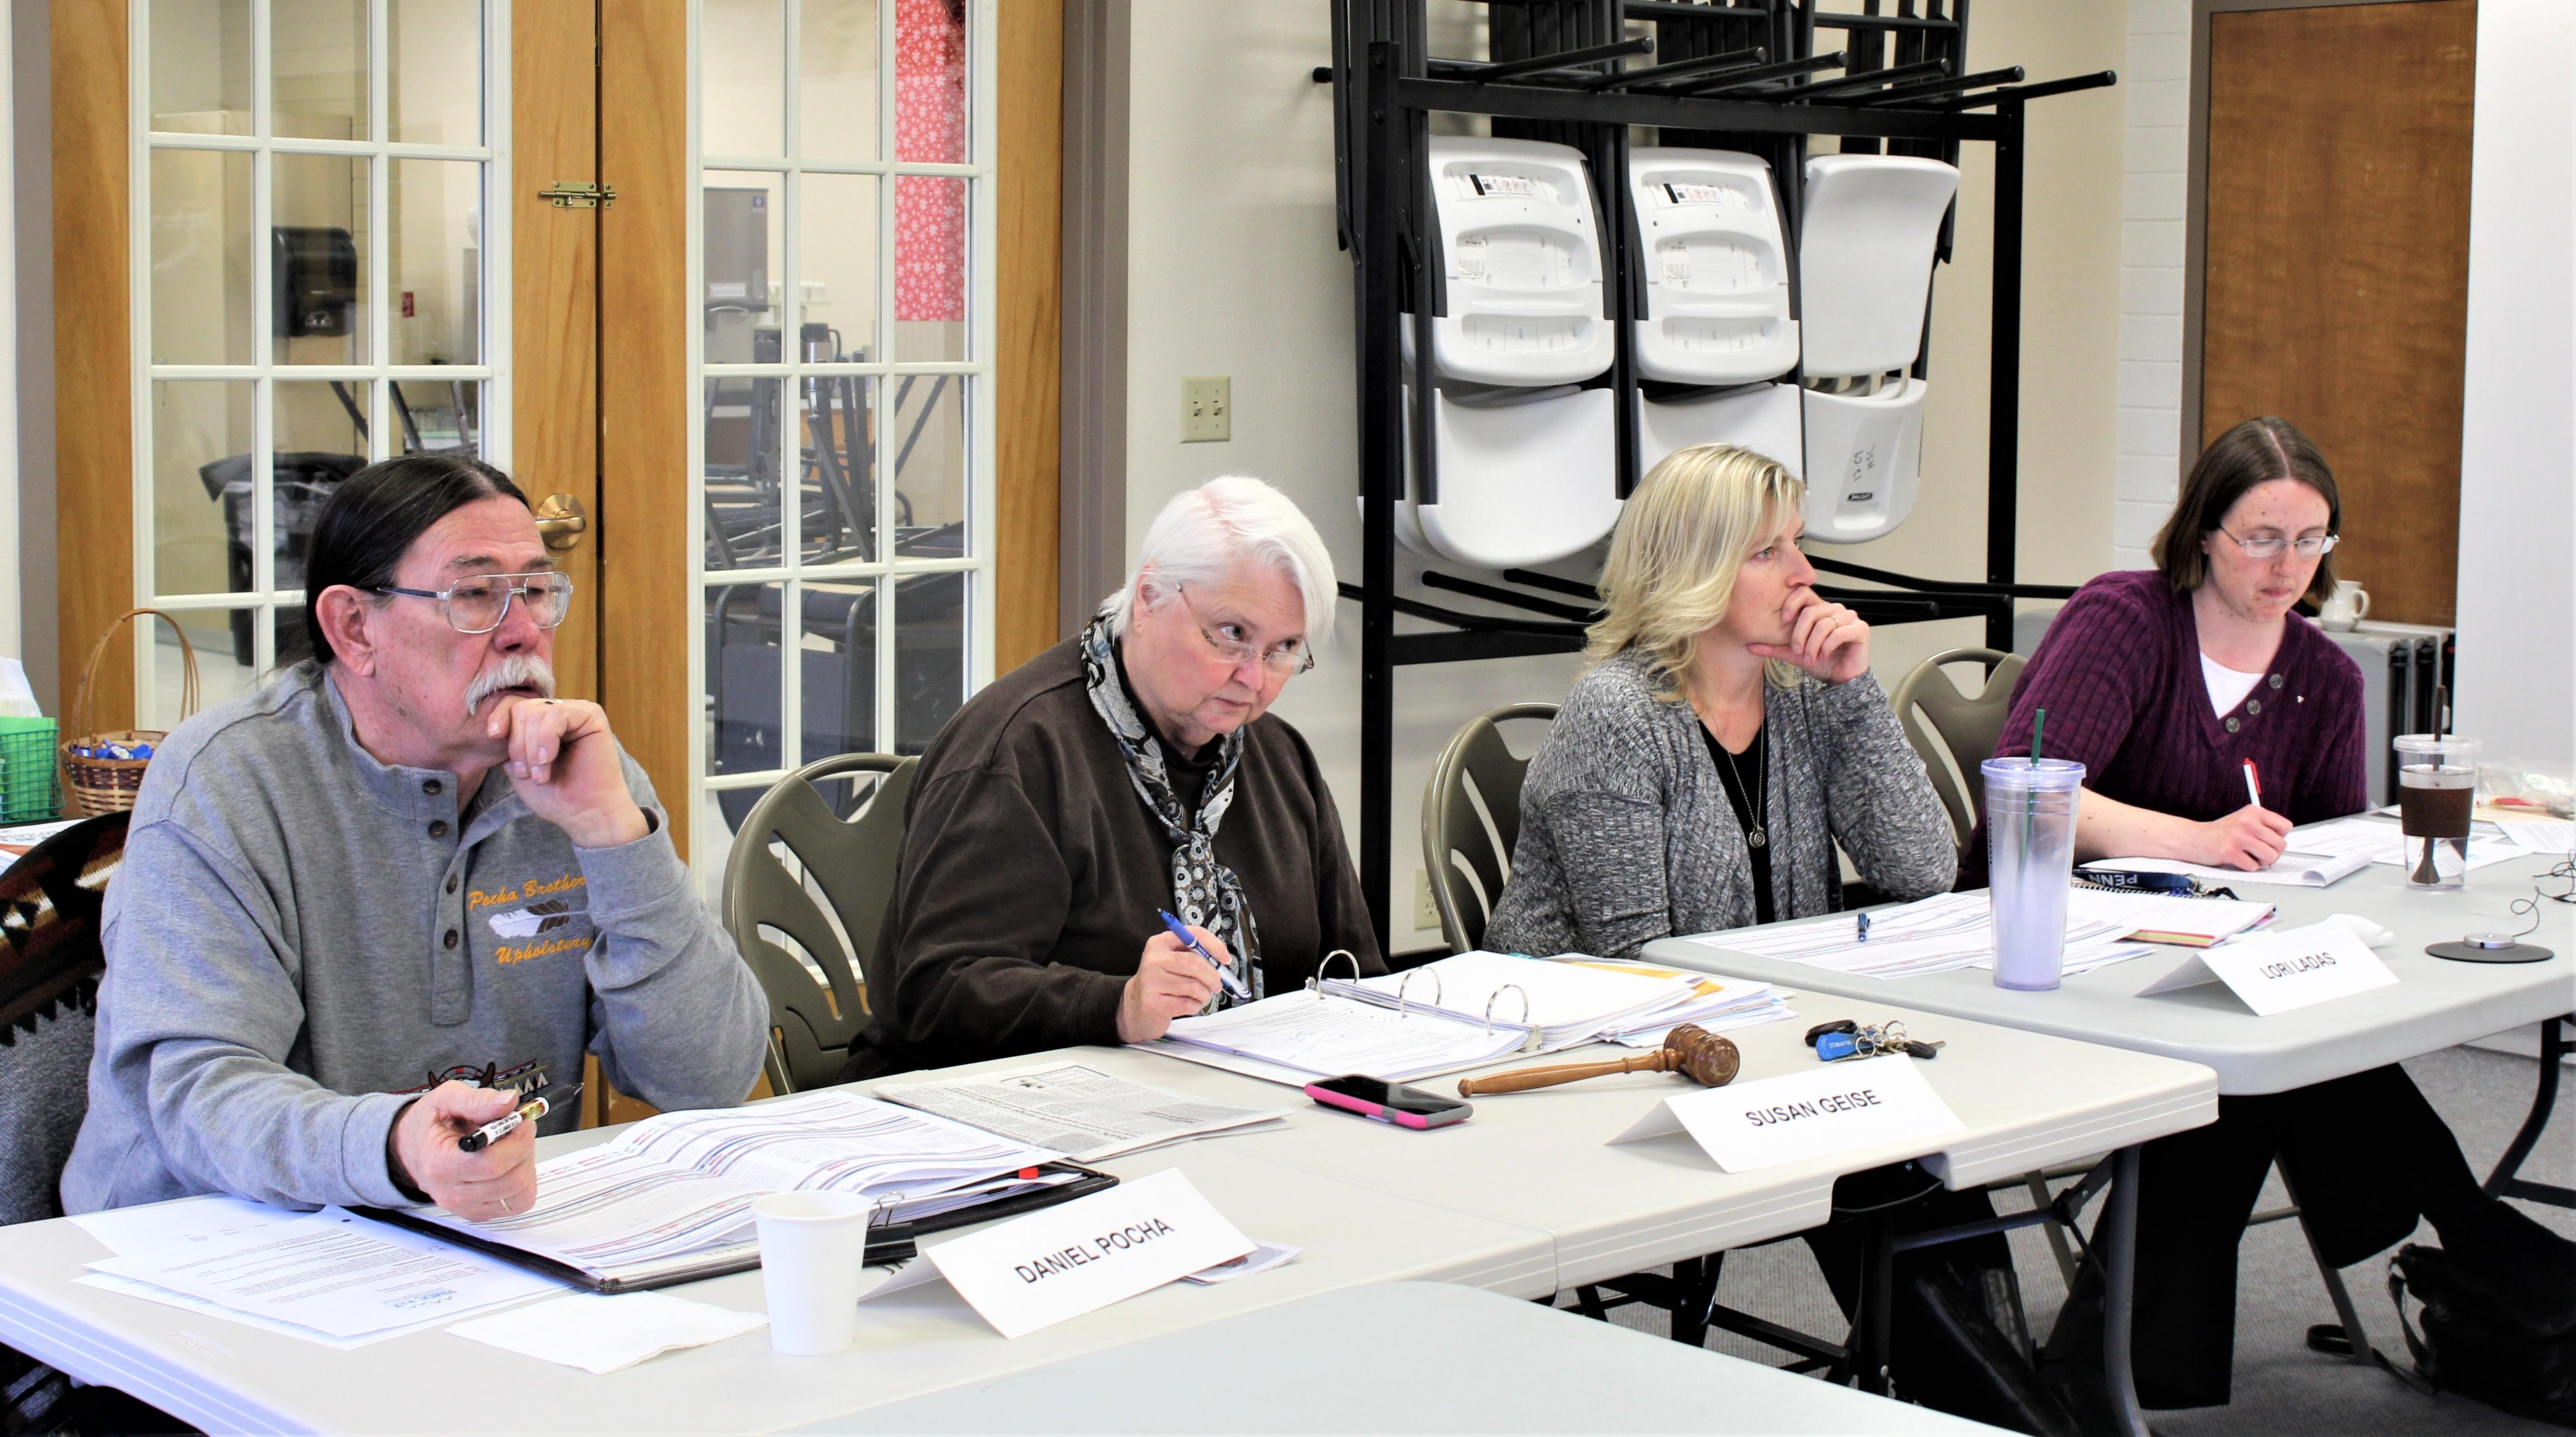 Photo of RMDC Board Meeting in progress.